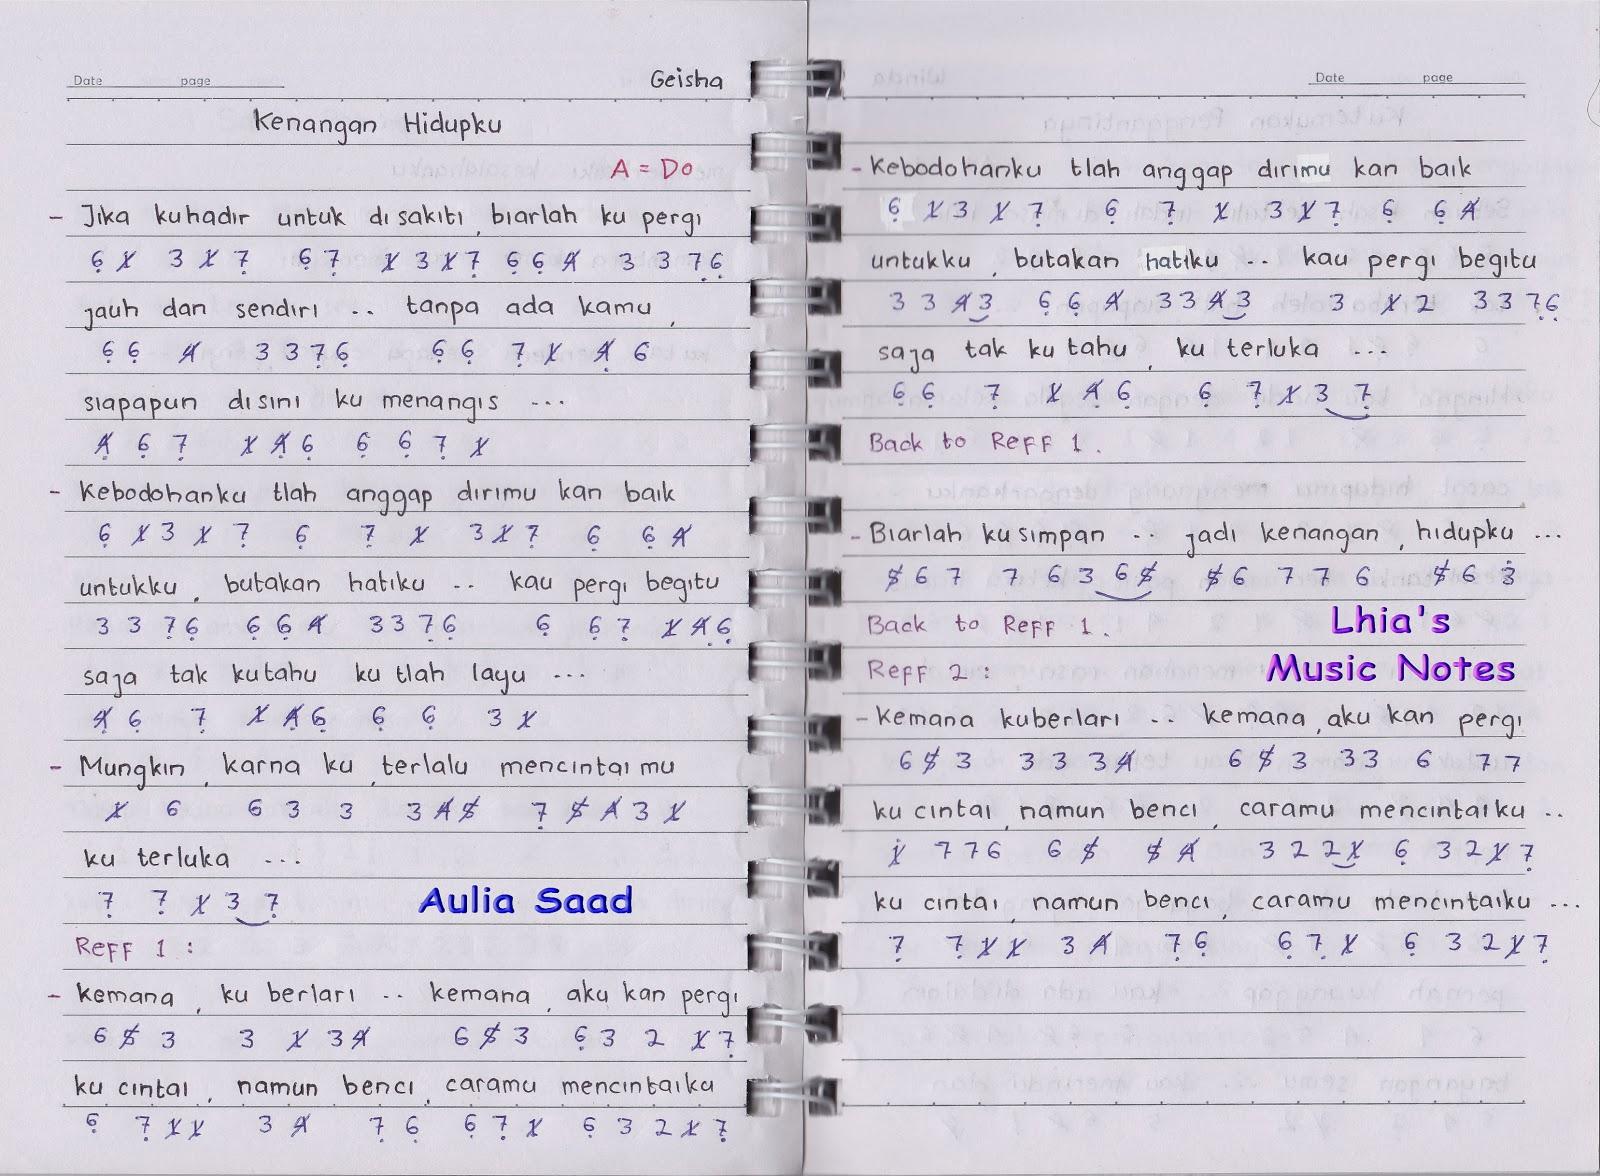 Not Angka Geisha Kenangan Hidupku Lhia S Music Notes